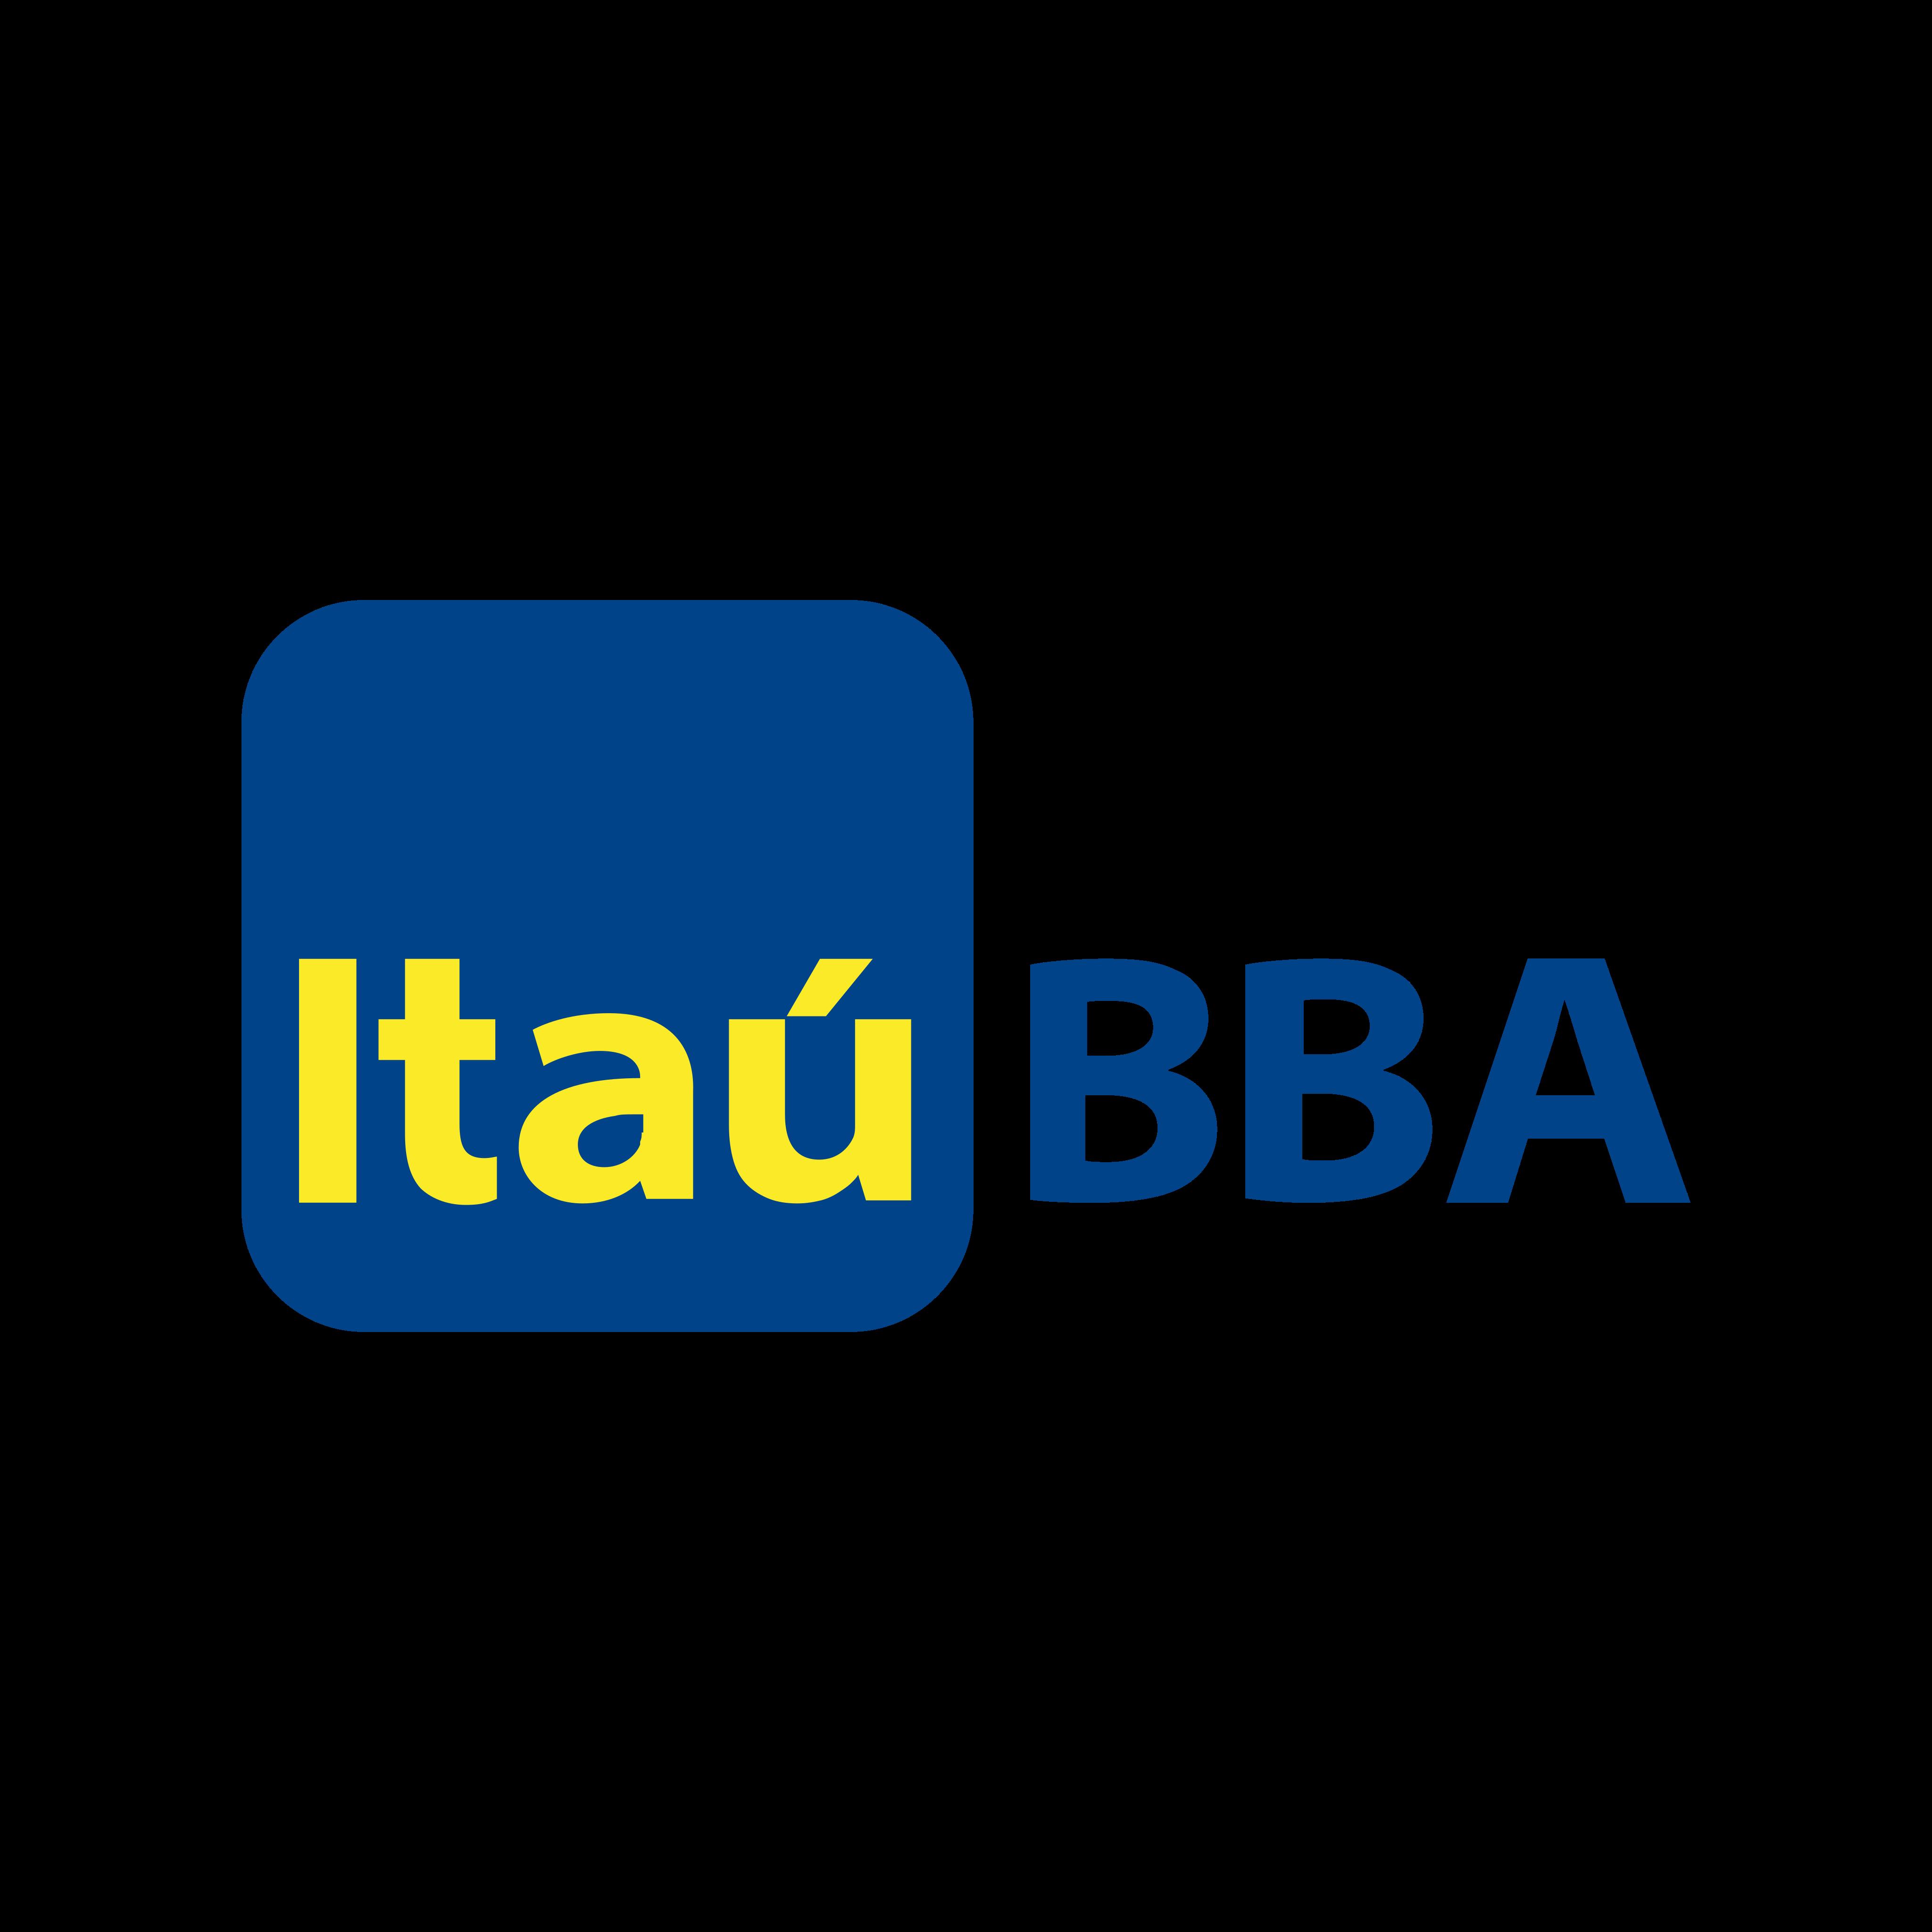 Itaú BBA Logo PNG.